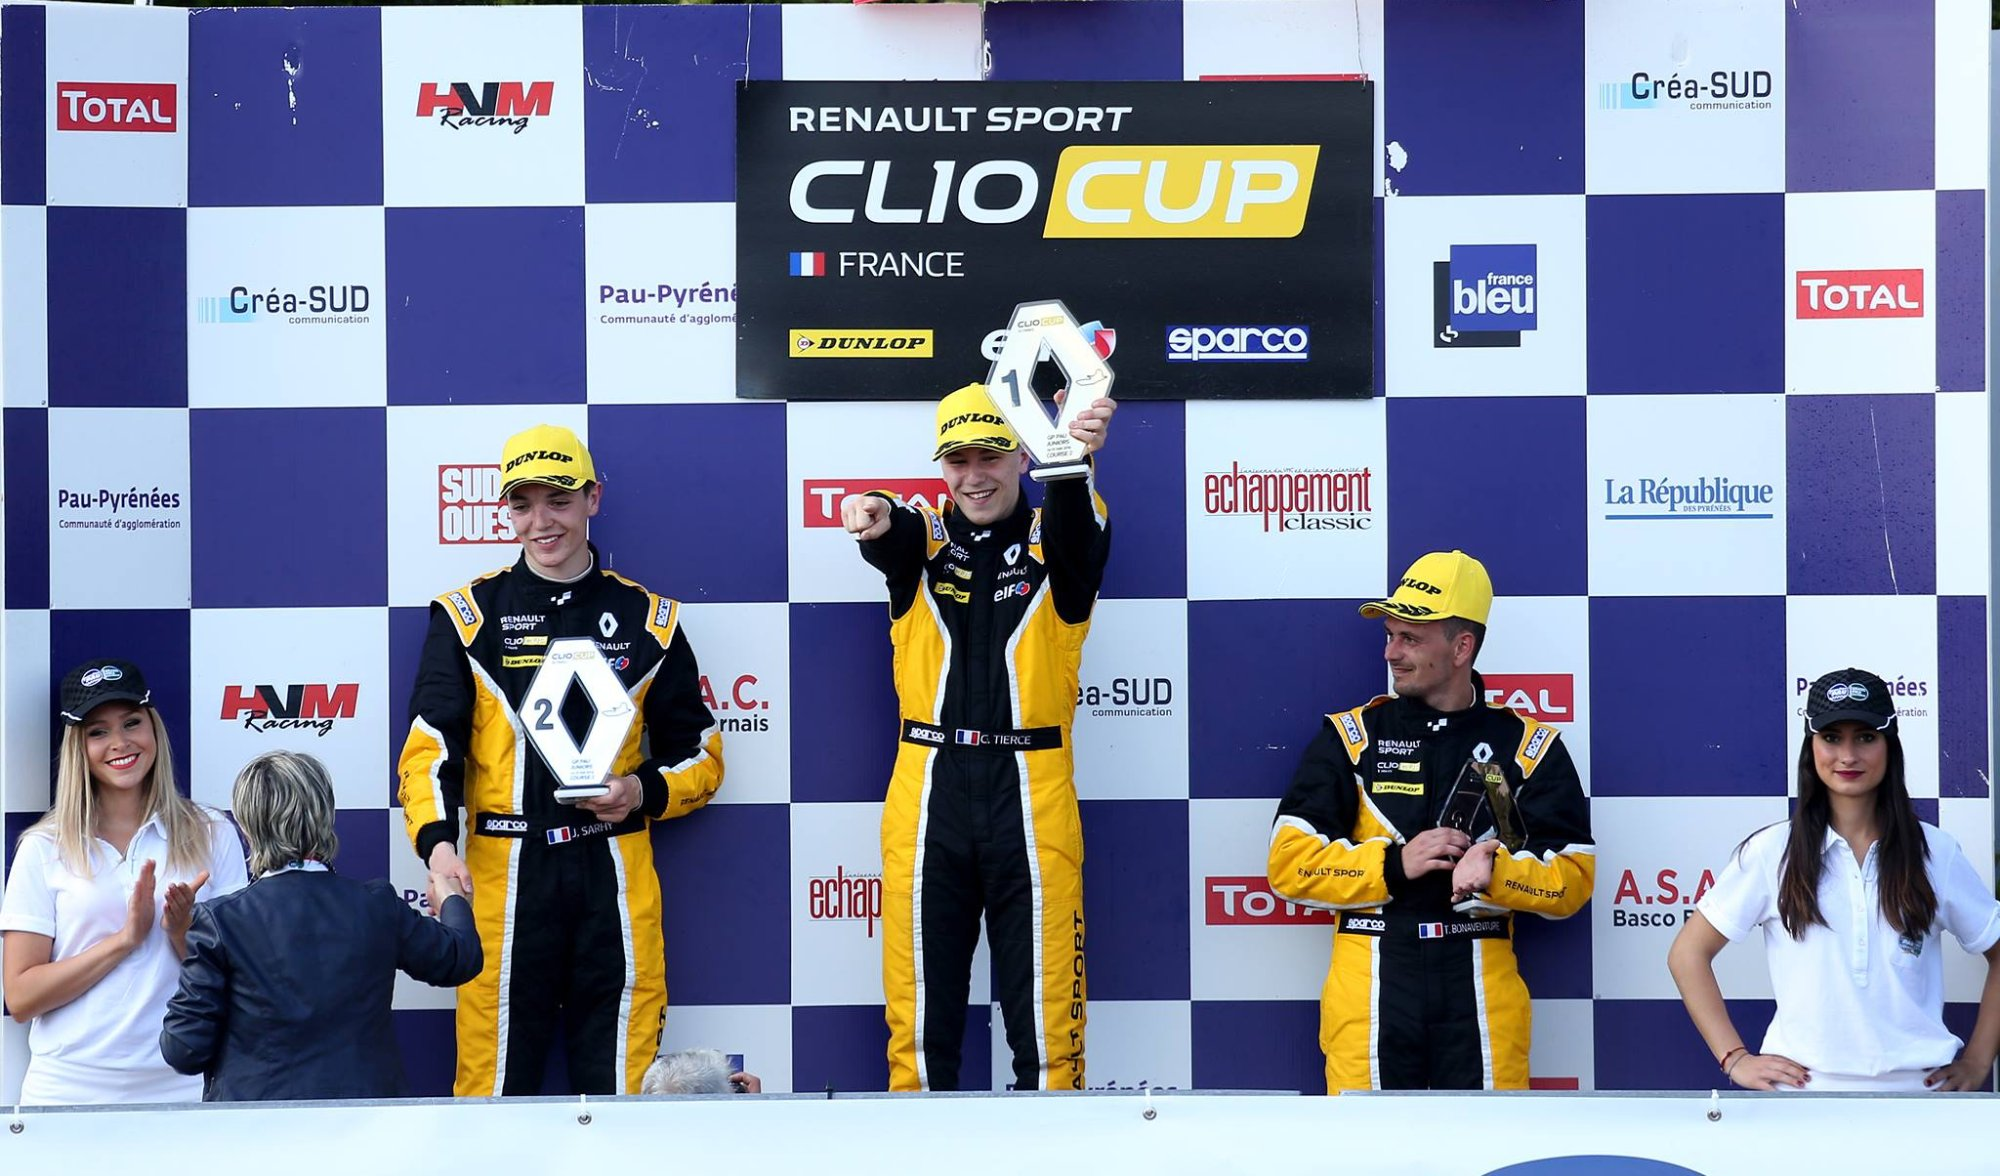 auto challenge competition pau clio cup 2016